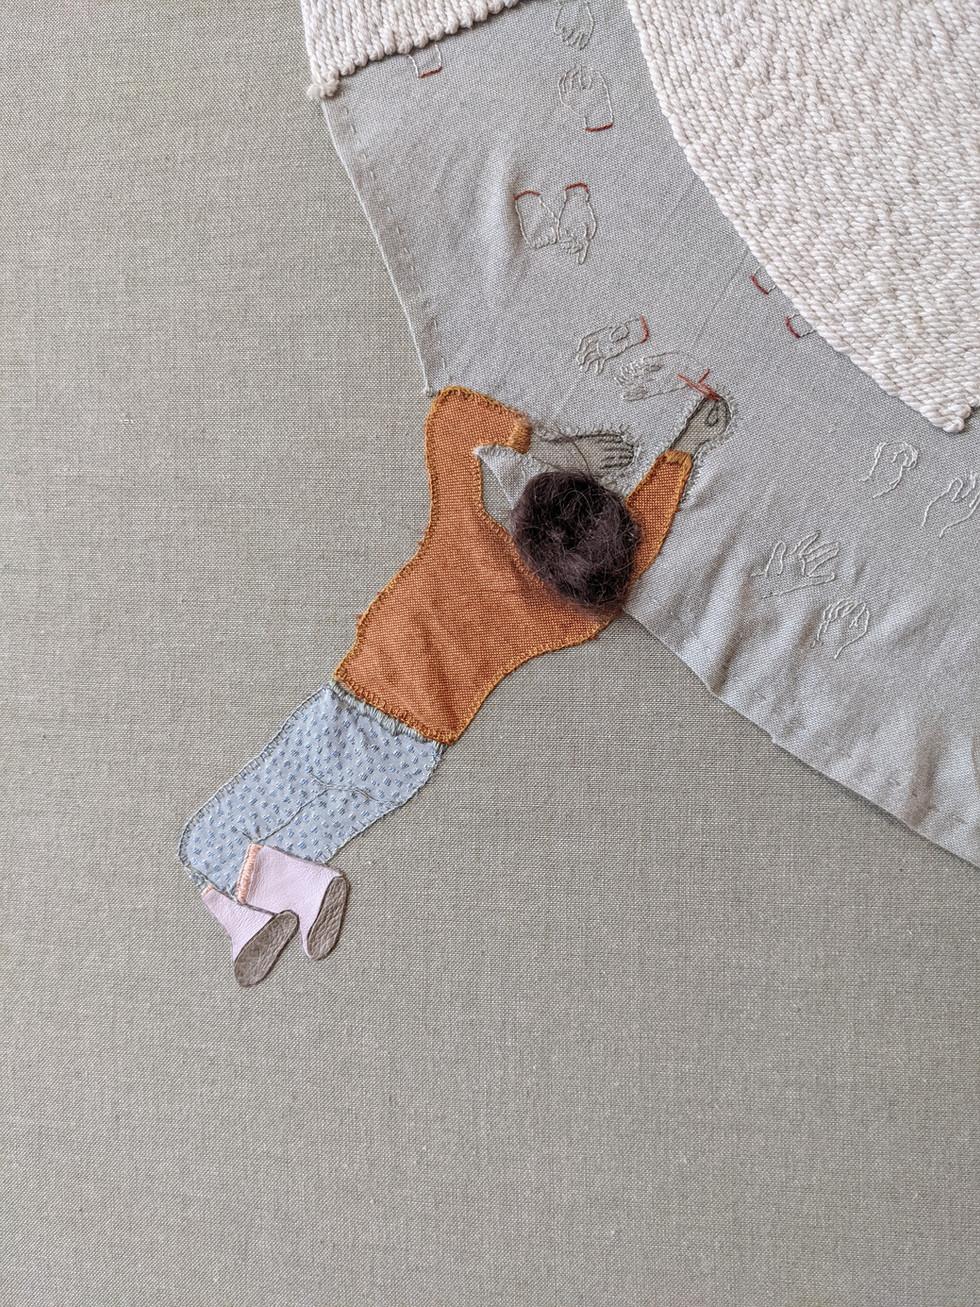 Giant rug (detail)